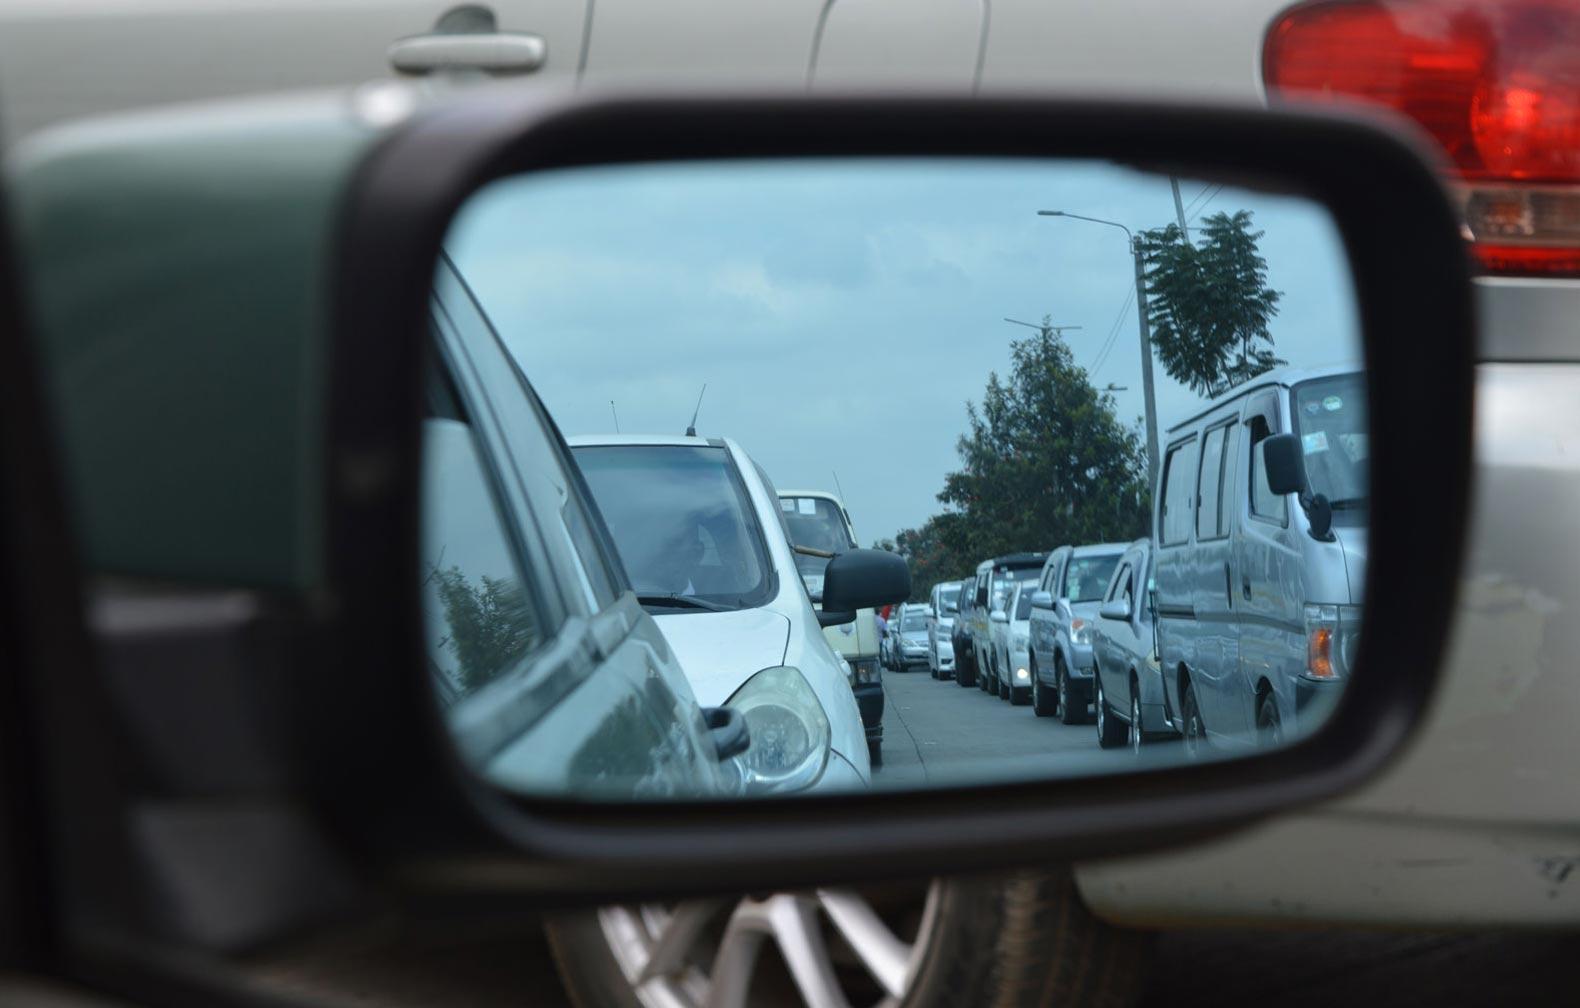 modere a velocidade - trânsito